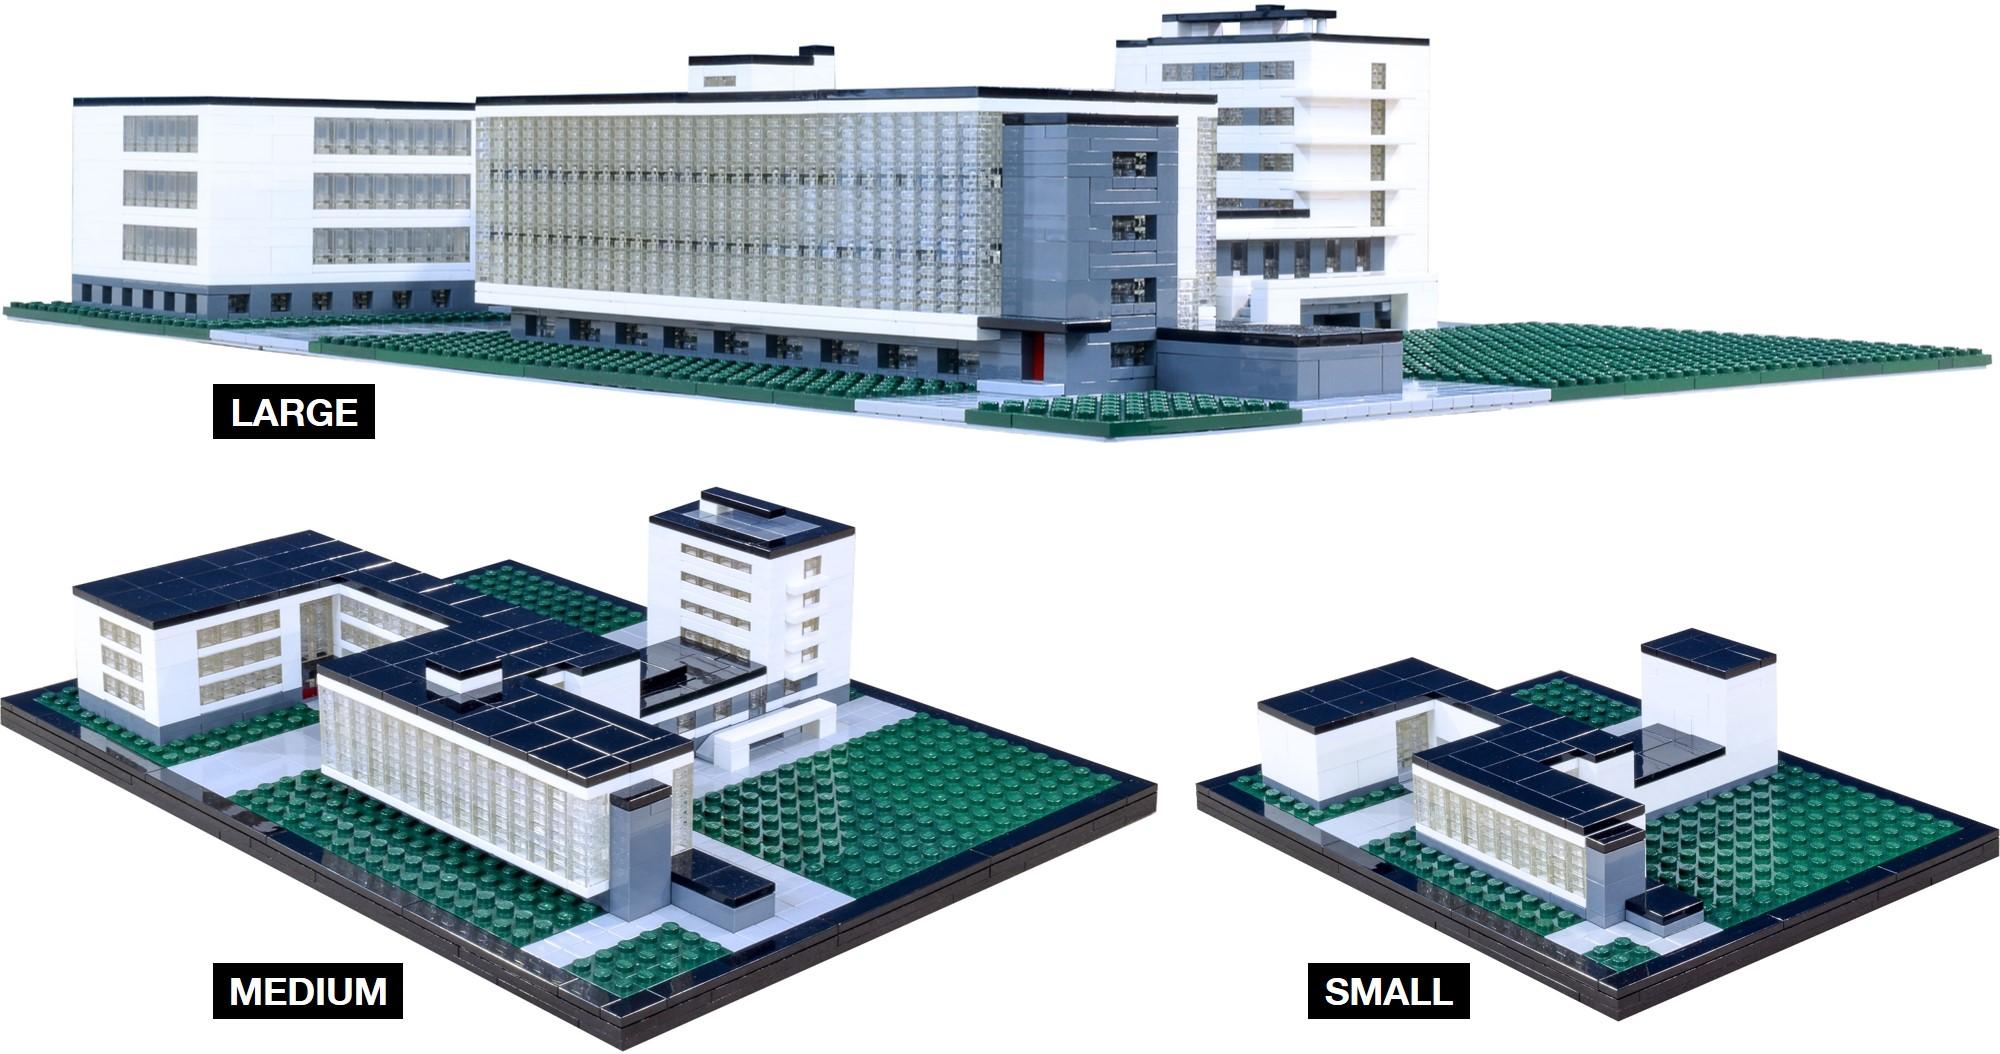 Bauhaus Dessau Brick Architect